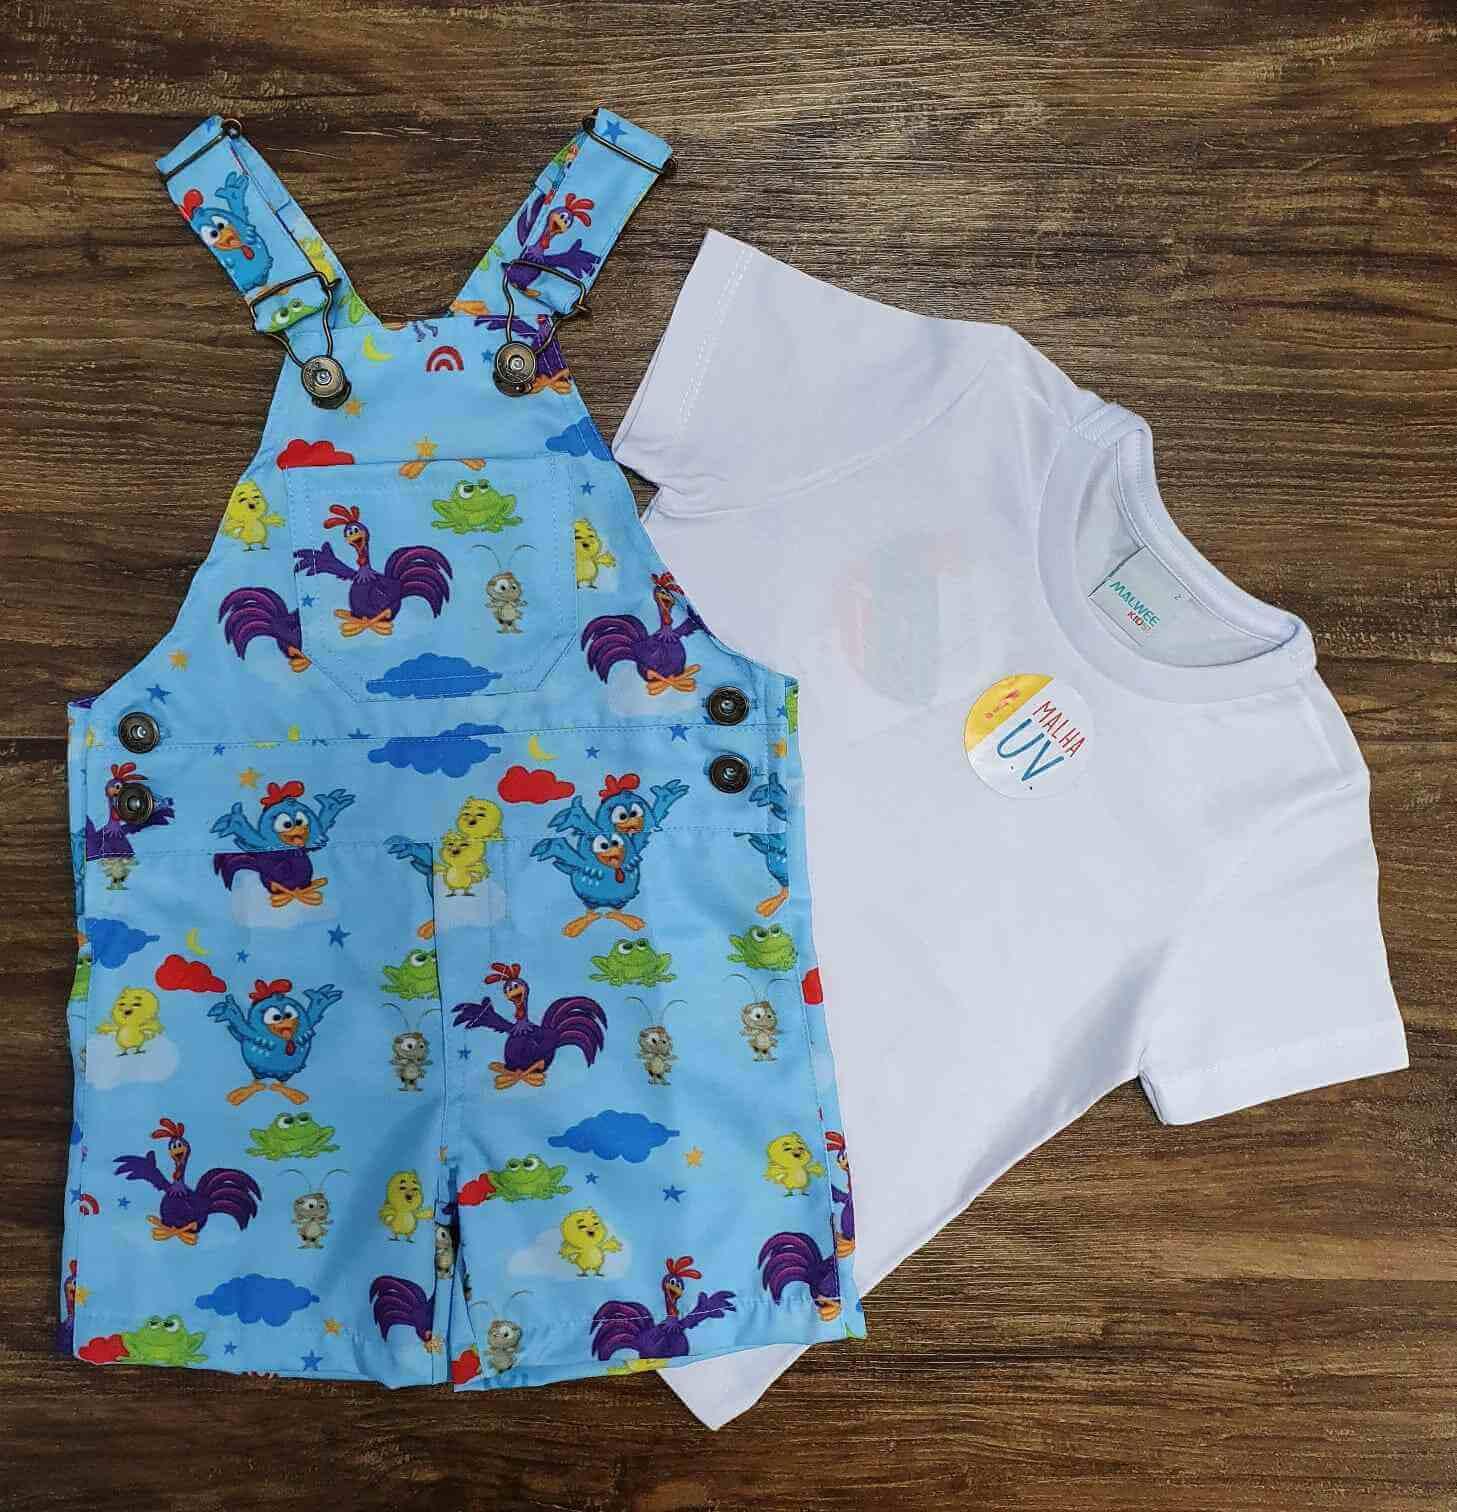 Look Jardineira Galinha Pintadinha com Camiseta Branca Infantil